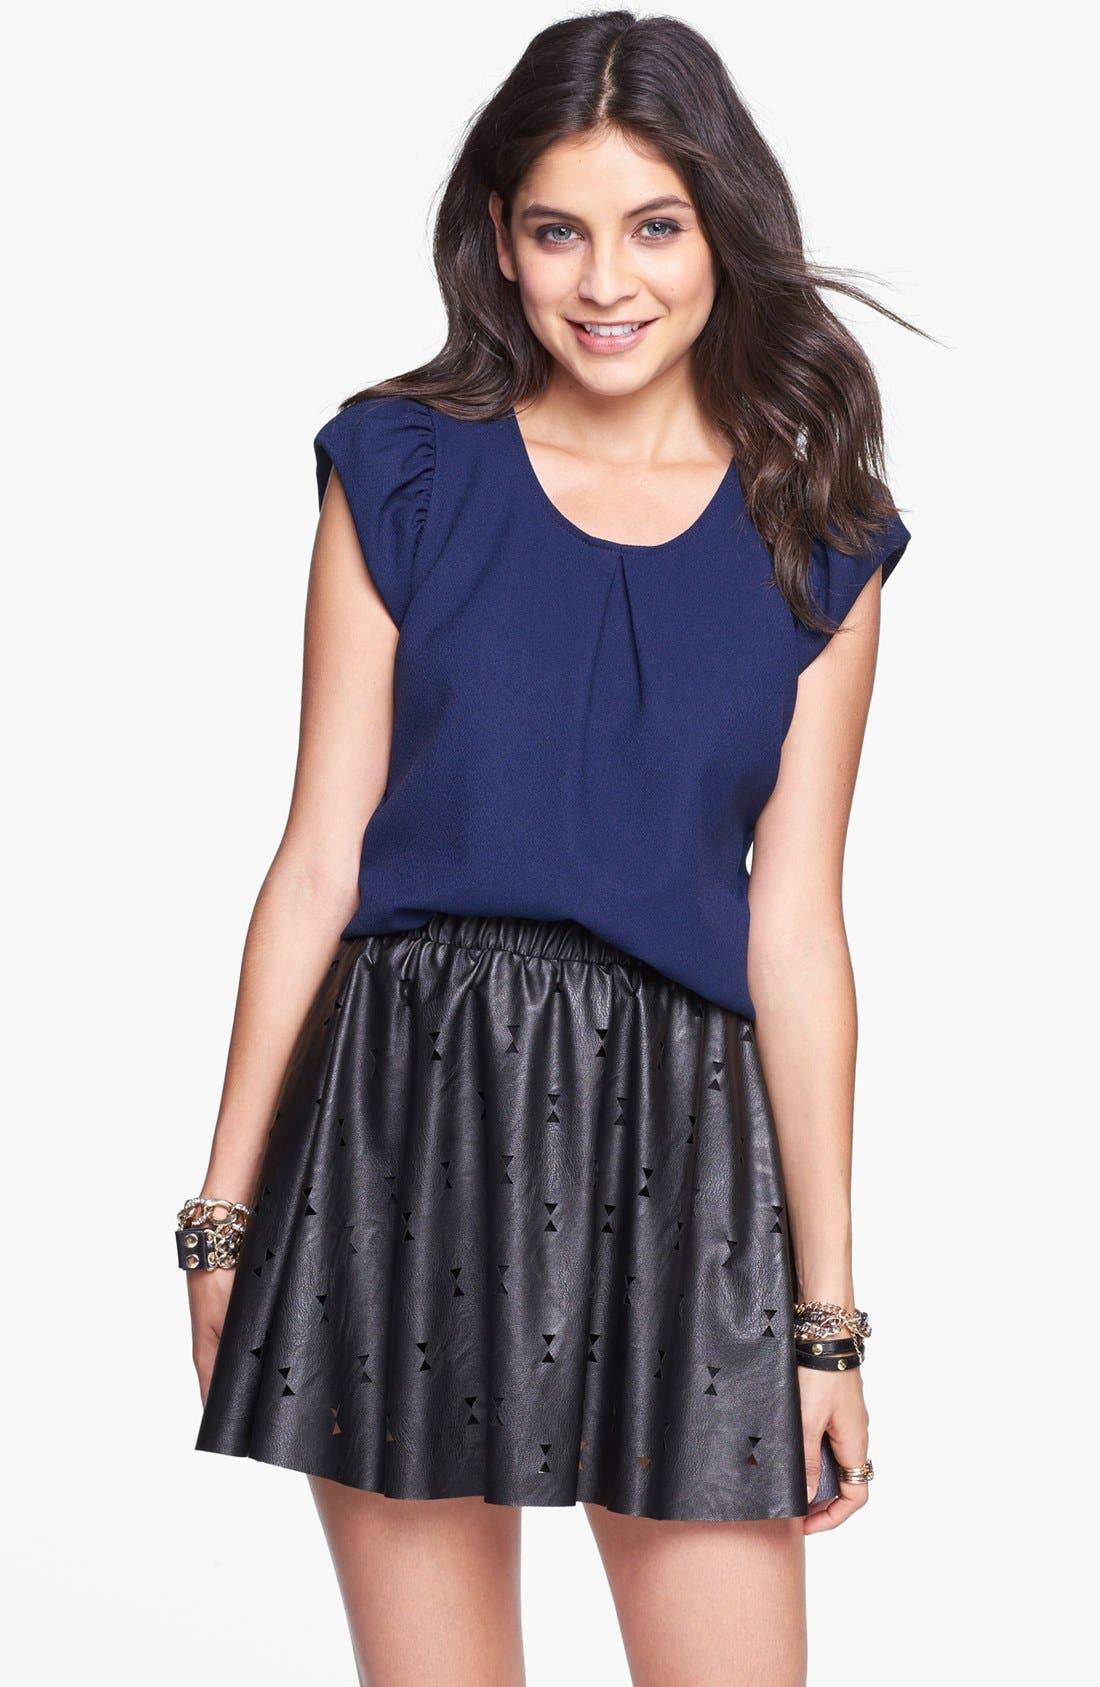 Main Image - Blu Pepper Laser Cut Faux Leather Skater Skirt (Juniors)